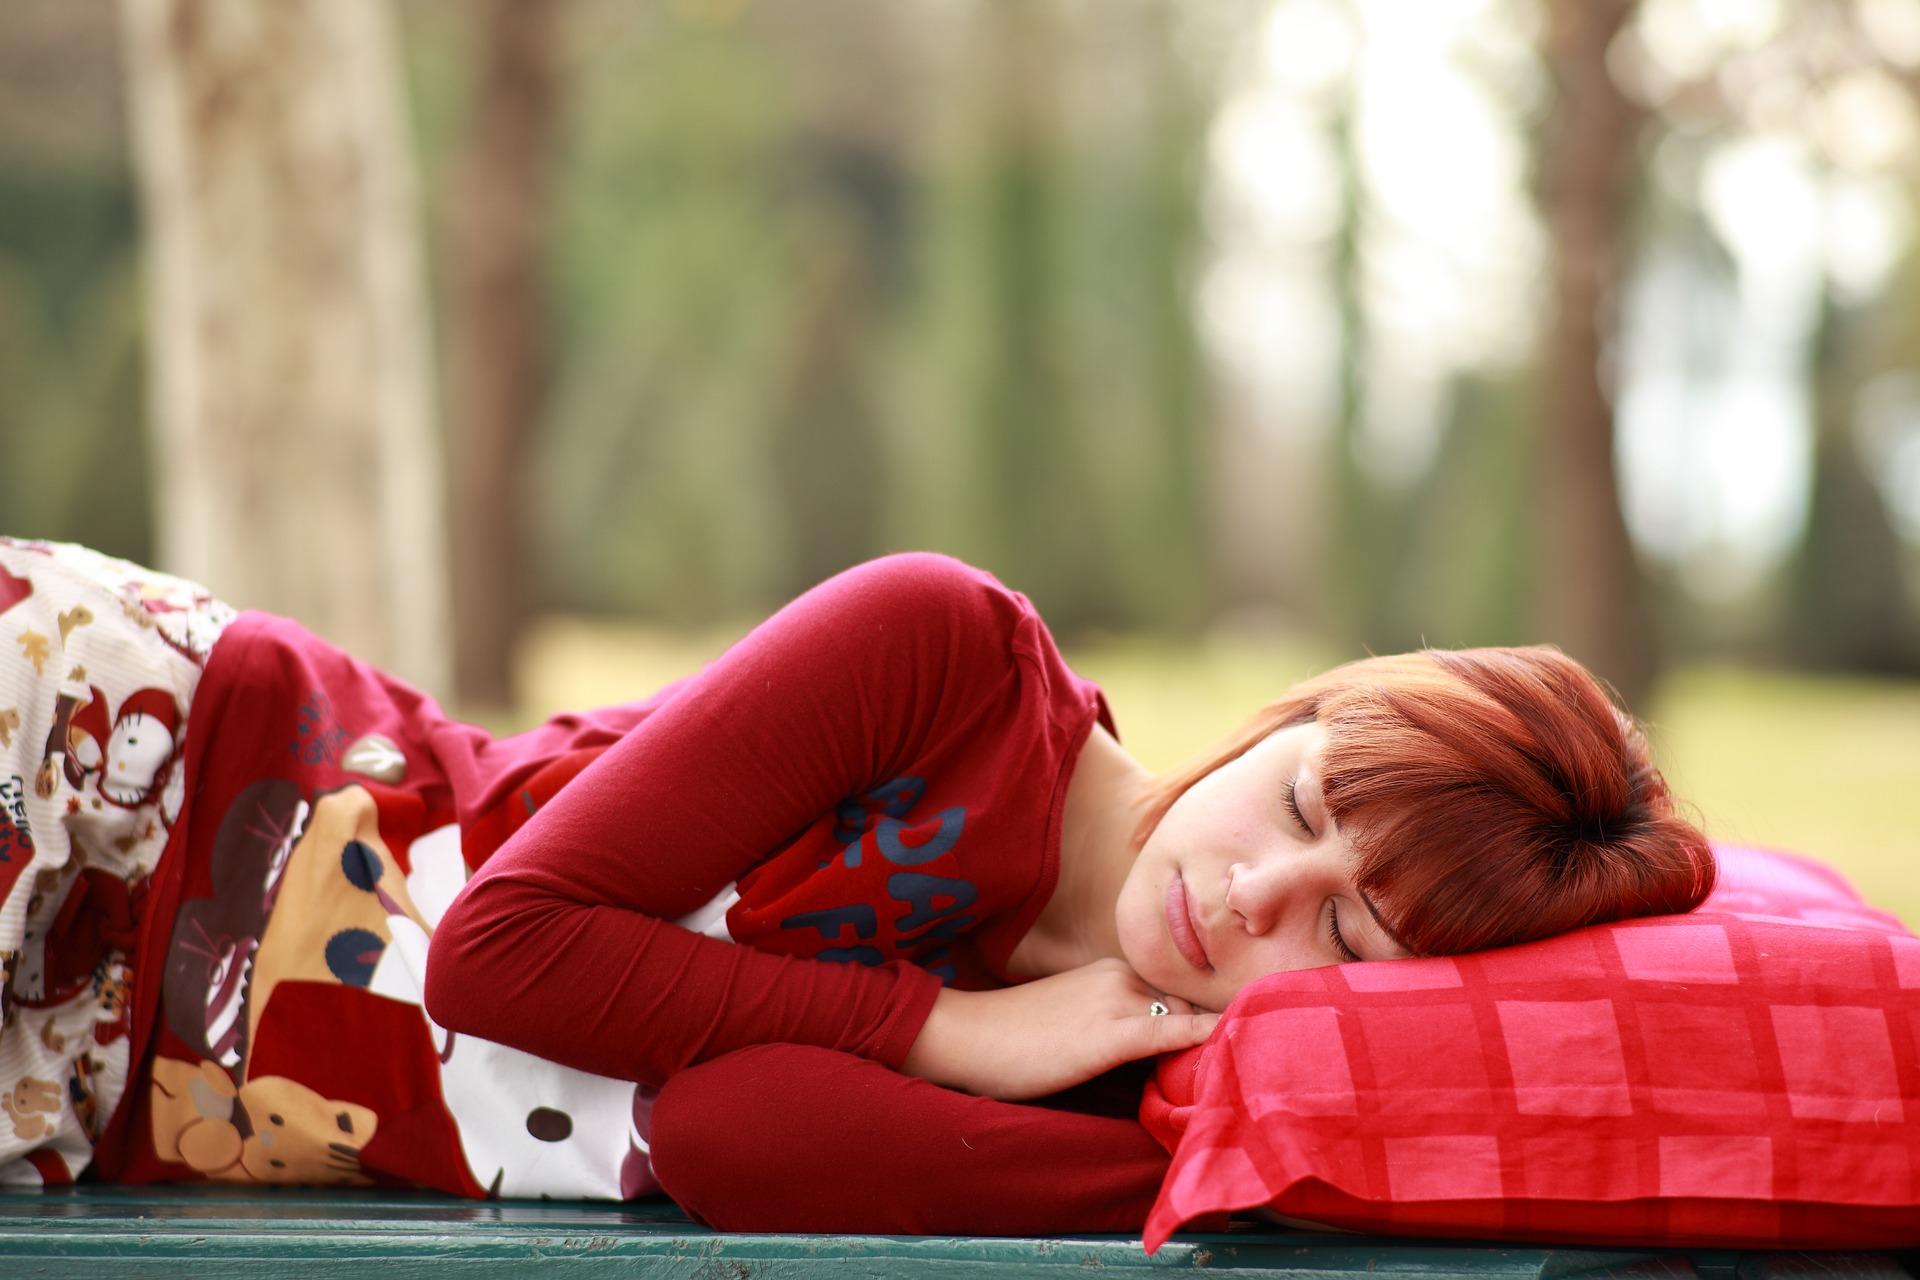 Premalo sna povećava rizik od srčanih bolesti